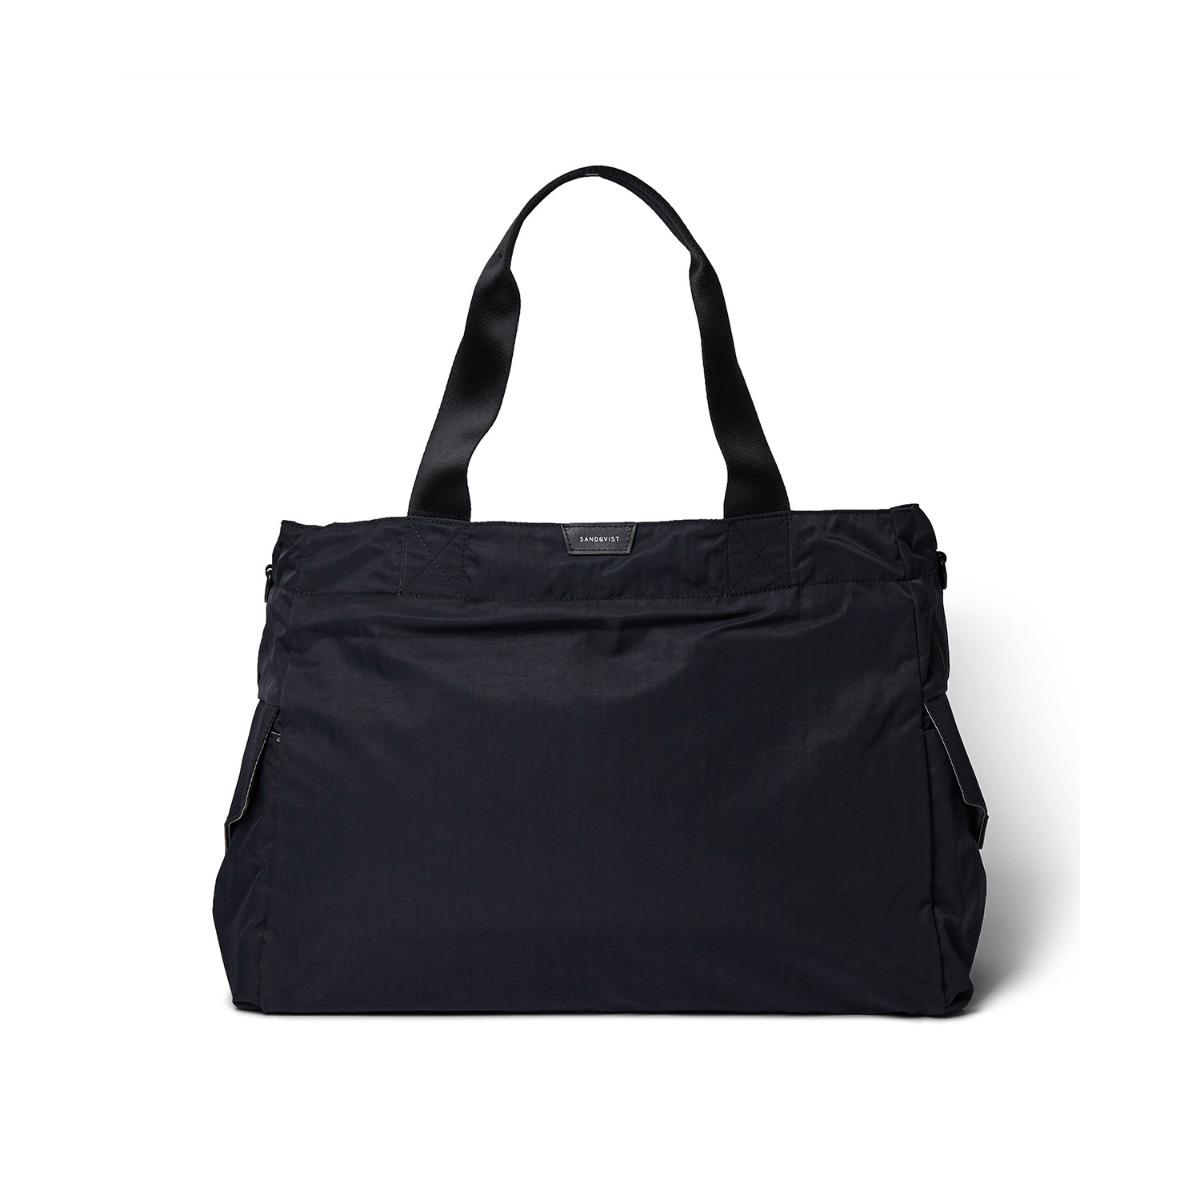 Designtorget Weekendbag Hailey svart